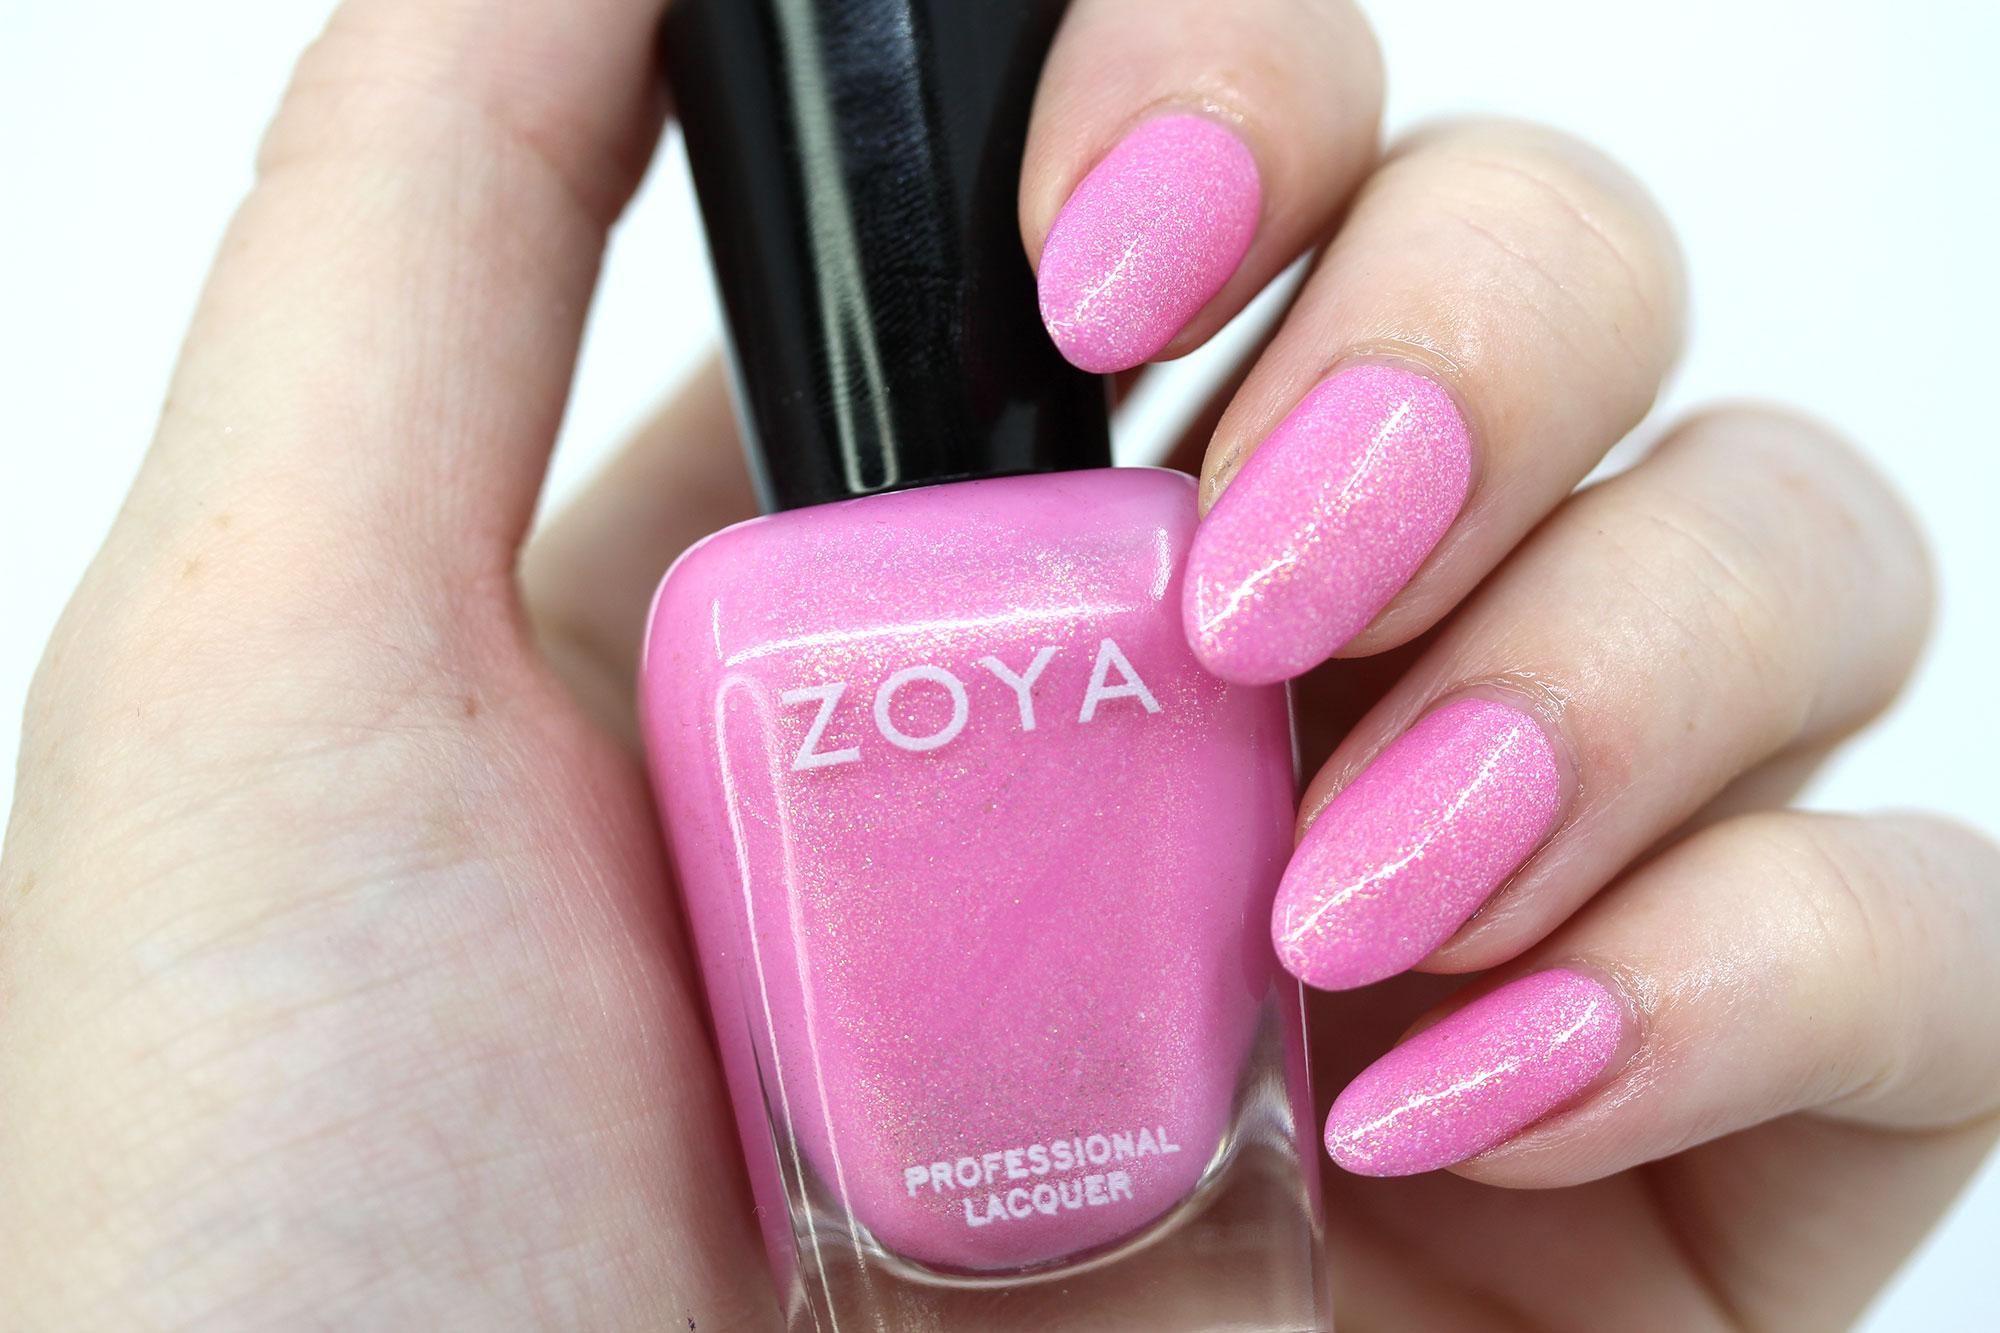 Zoya Wanda swatch